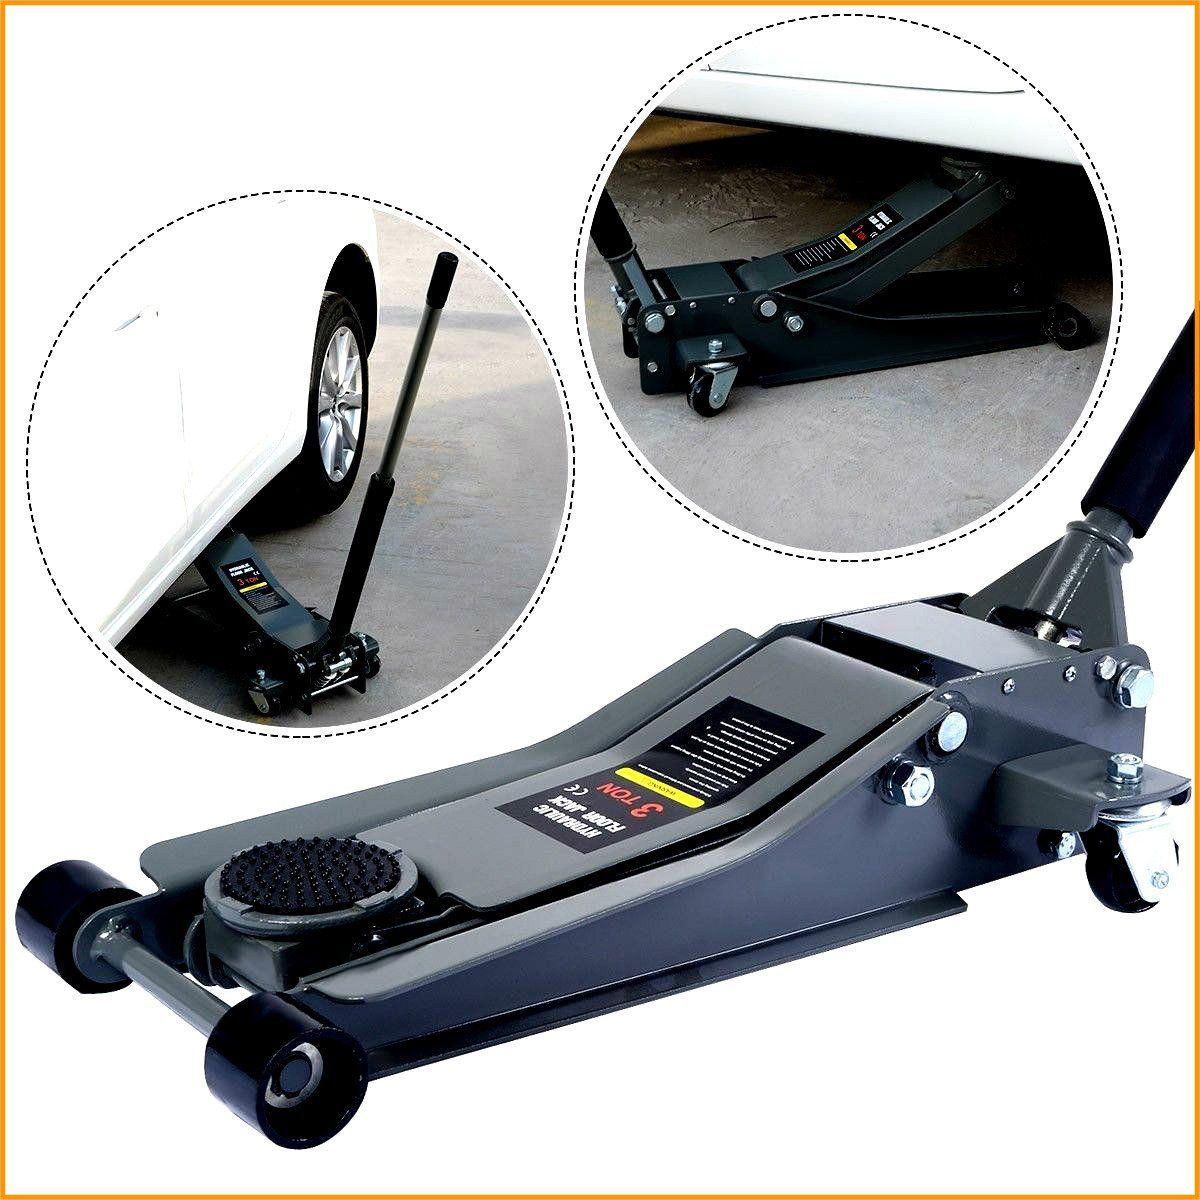 Best Low Profile Floor Jack For Your Garage Or Workshop Pumping Car Floor Jack Low Profile